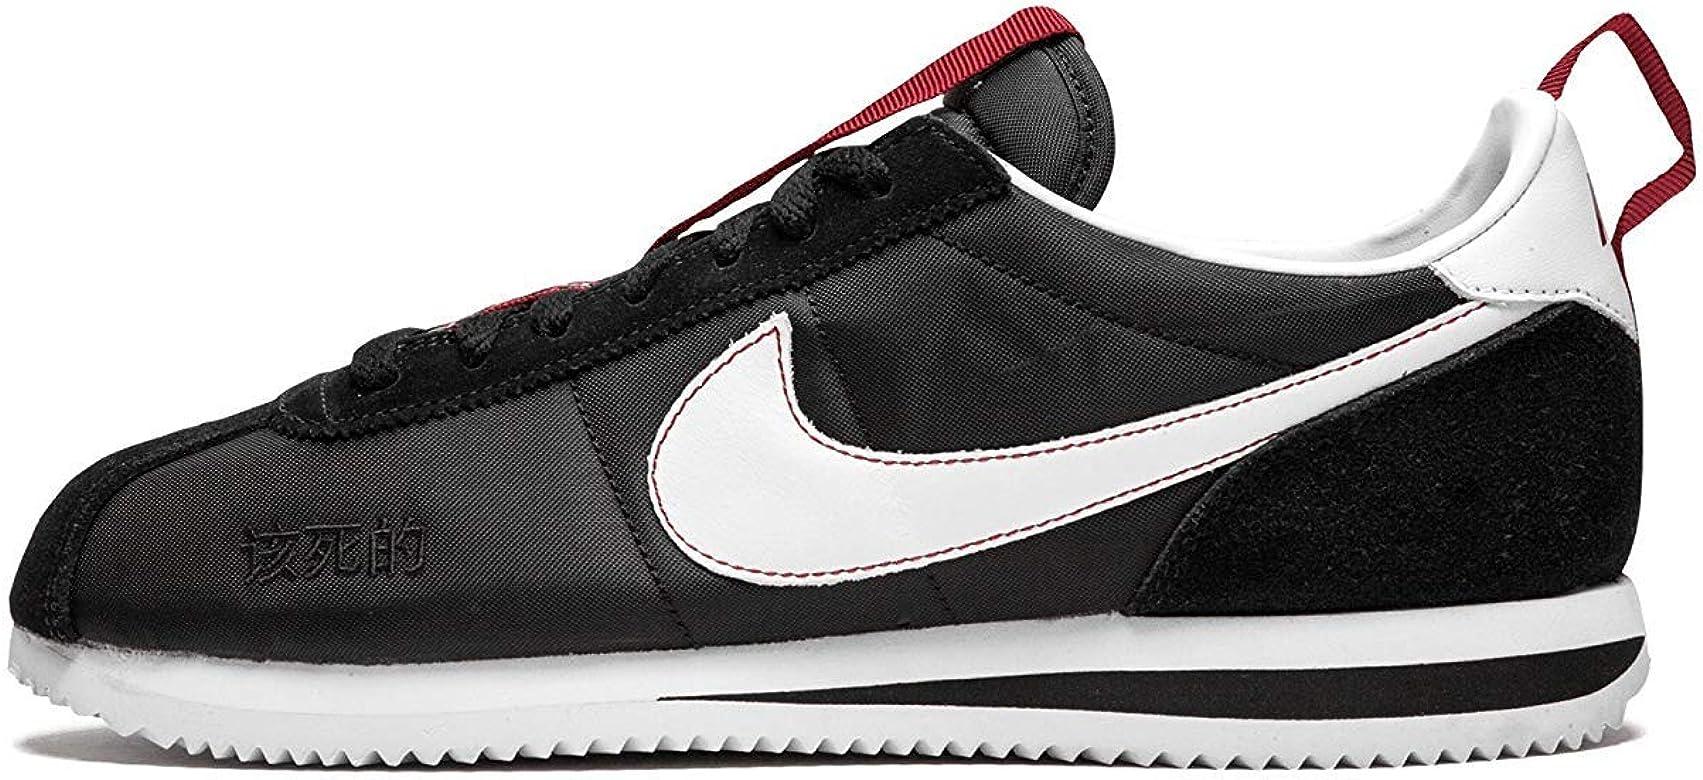 Nike Cortez Kenny III 3 Kendrick Lamar